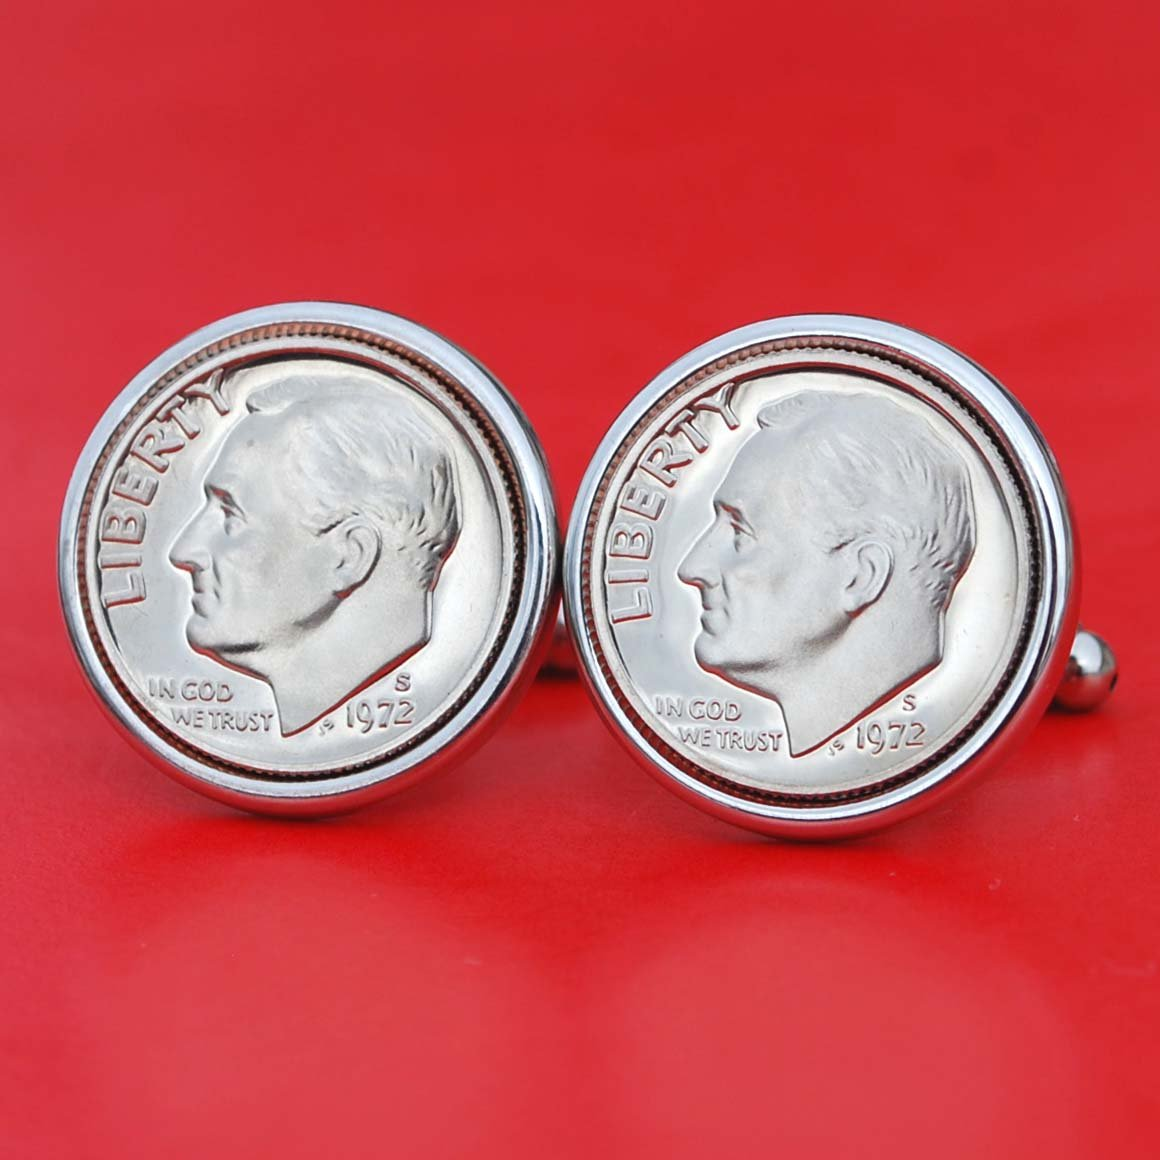 US Branded goods 1972 Roosevelt Dime Gem BU Coin shopping 10 Cufflink Cent Uncirculated